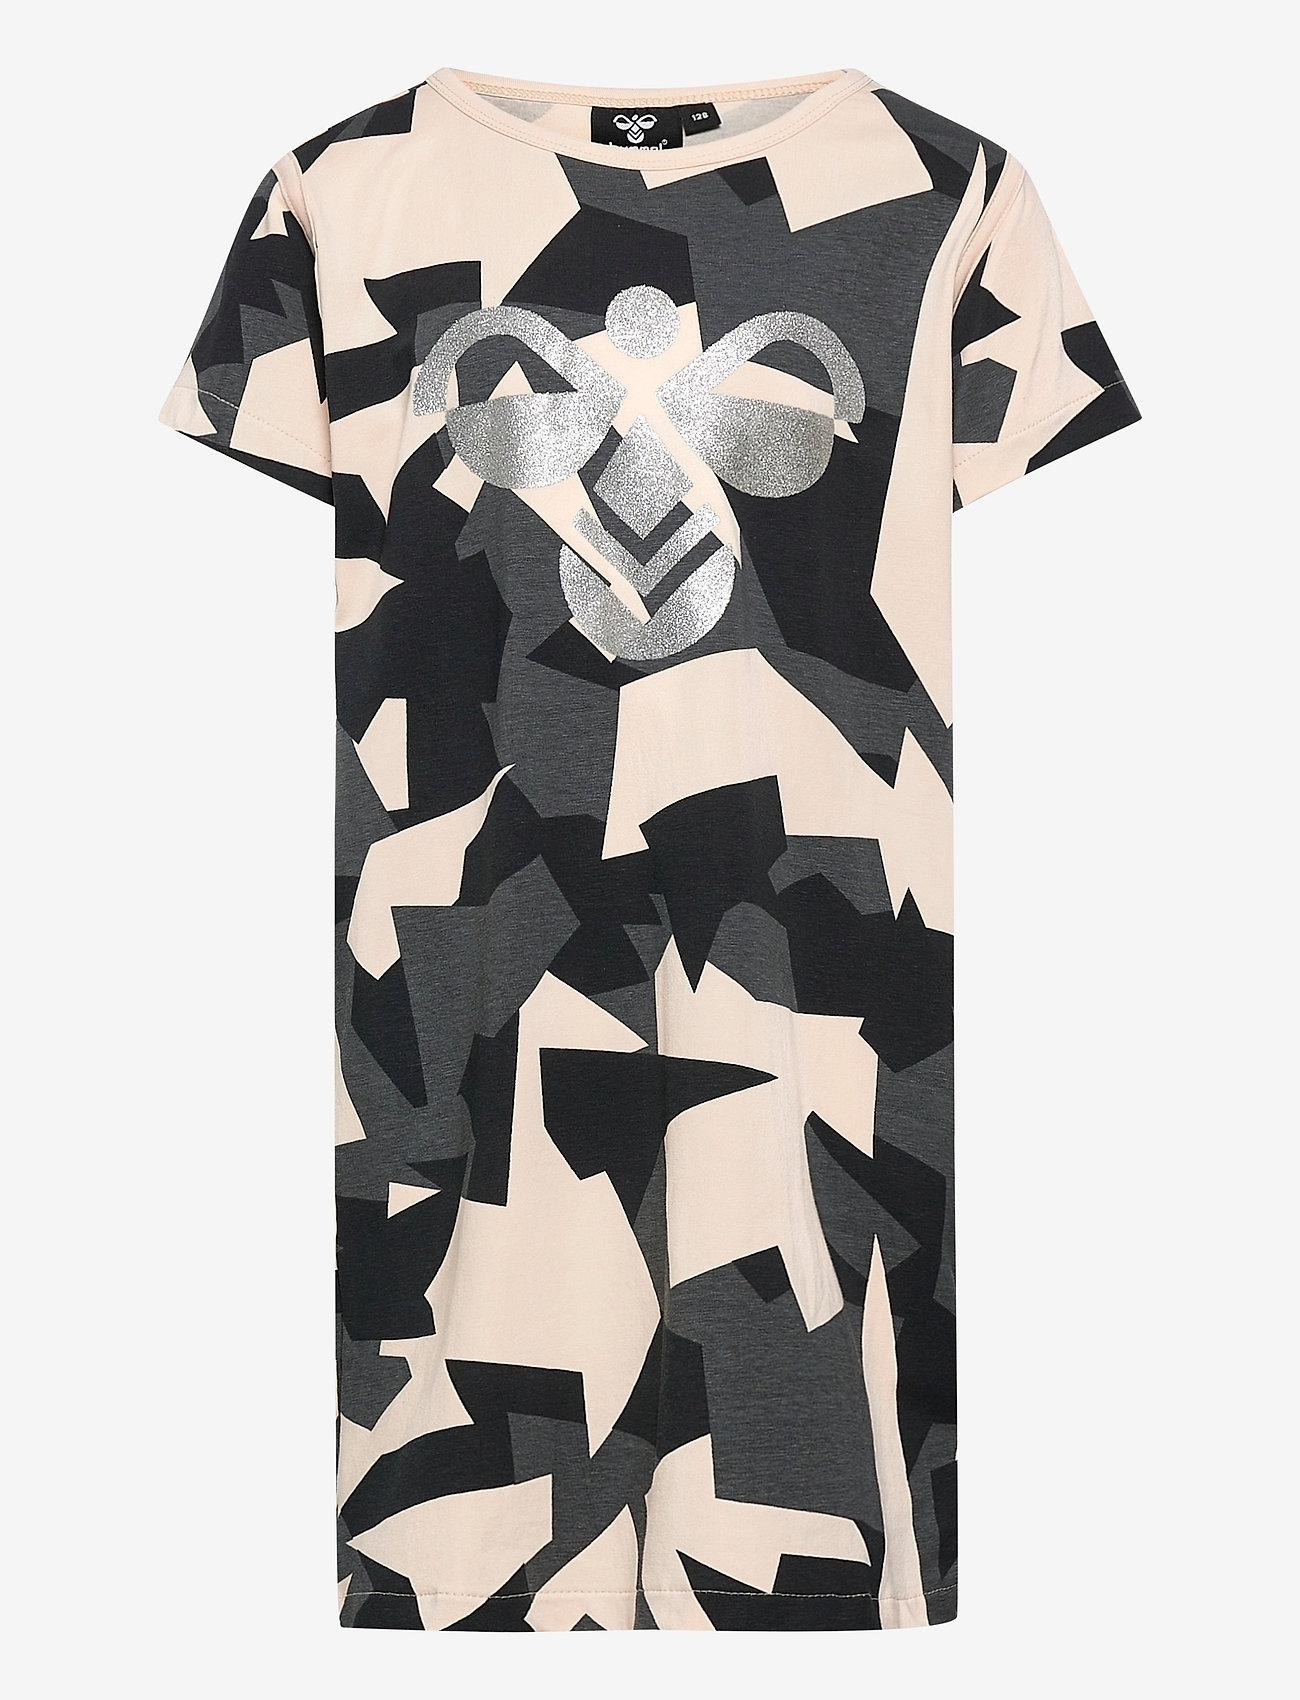 Hummel - hmlDISH DRESS S/S - kleider - black/black - 0